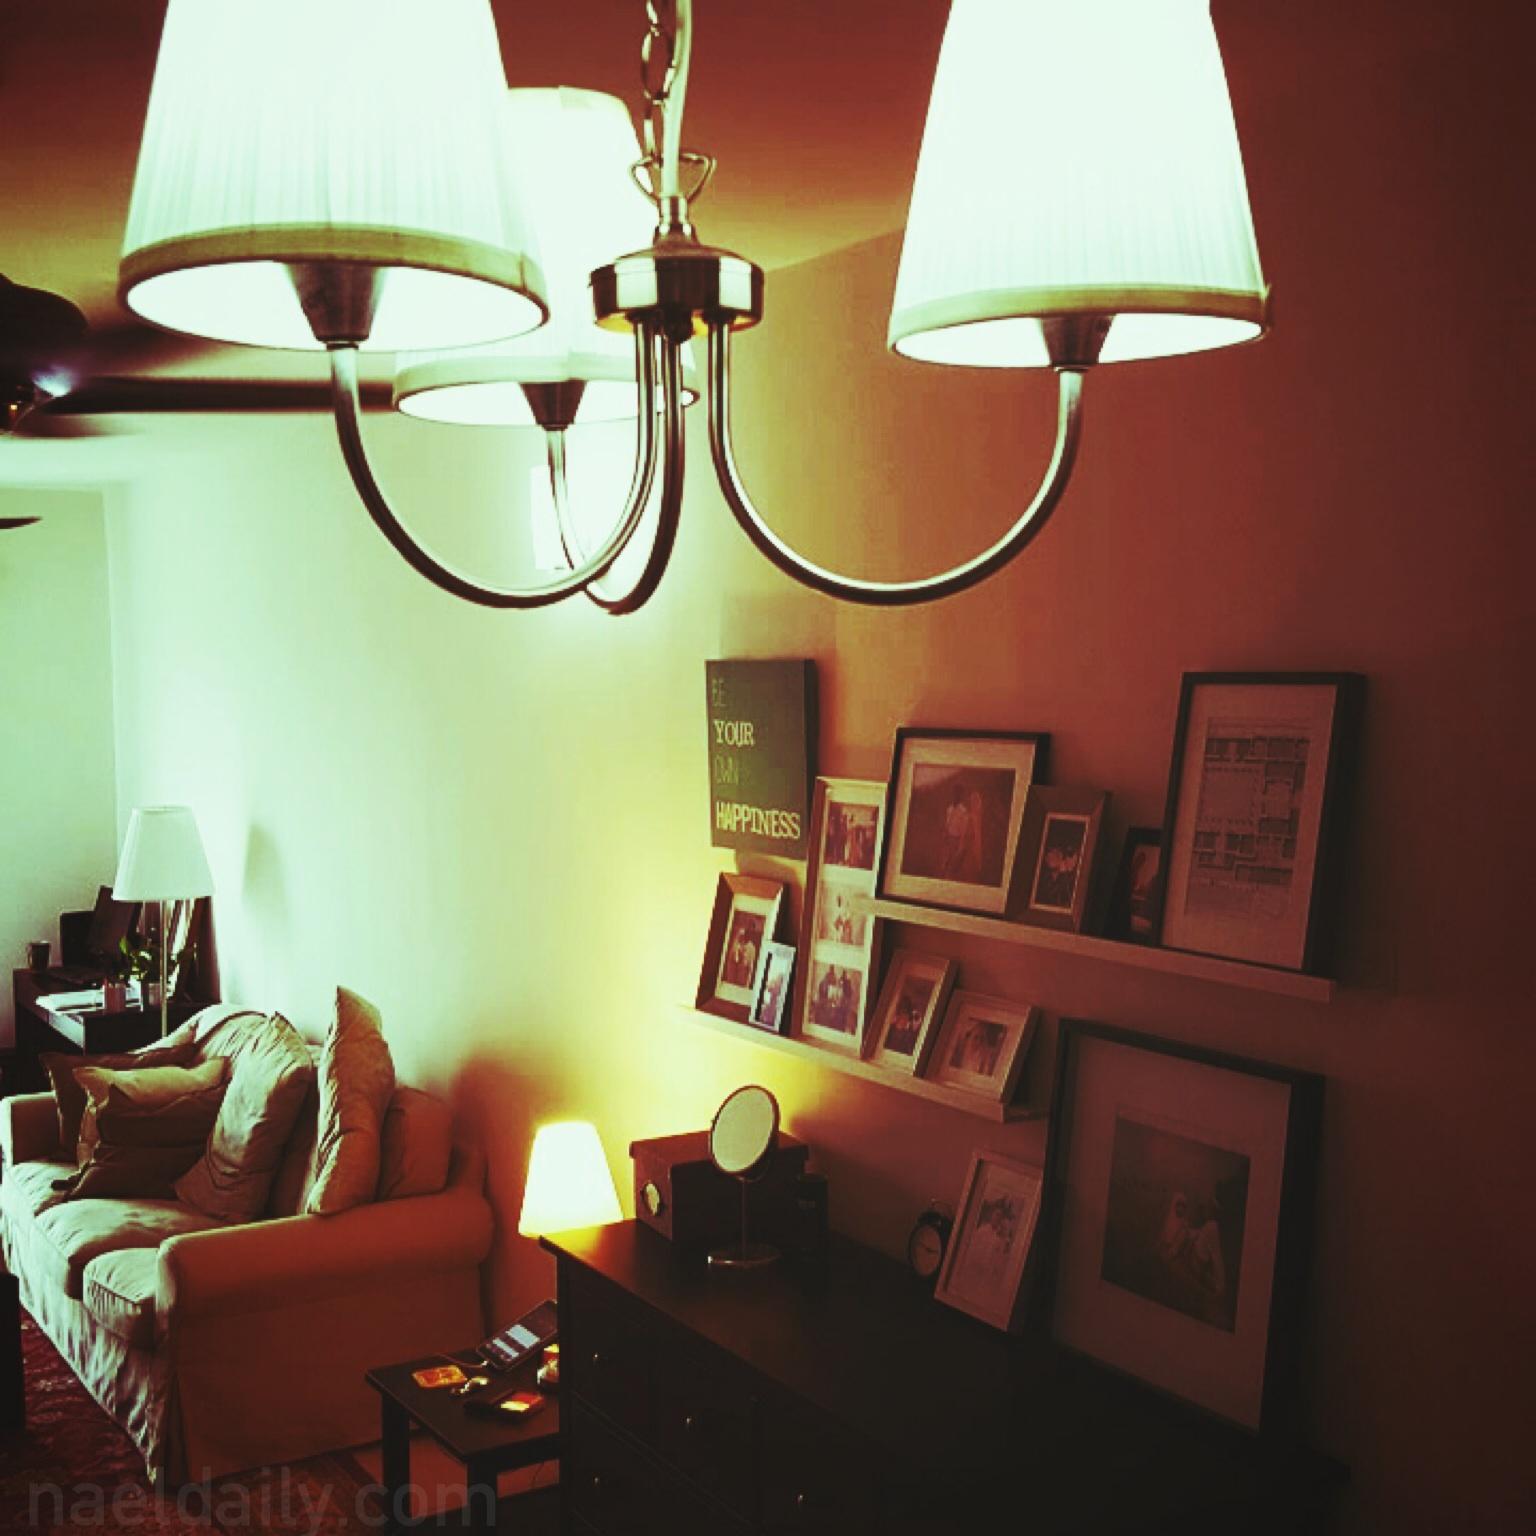 wall decor of ikea picture ledge. Black Bedroom Furniture Sets. Home Design Ideas